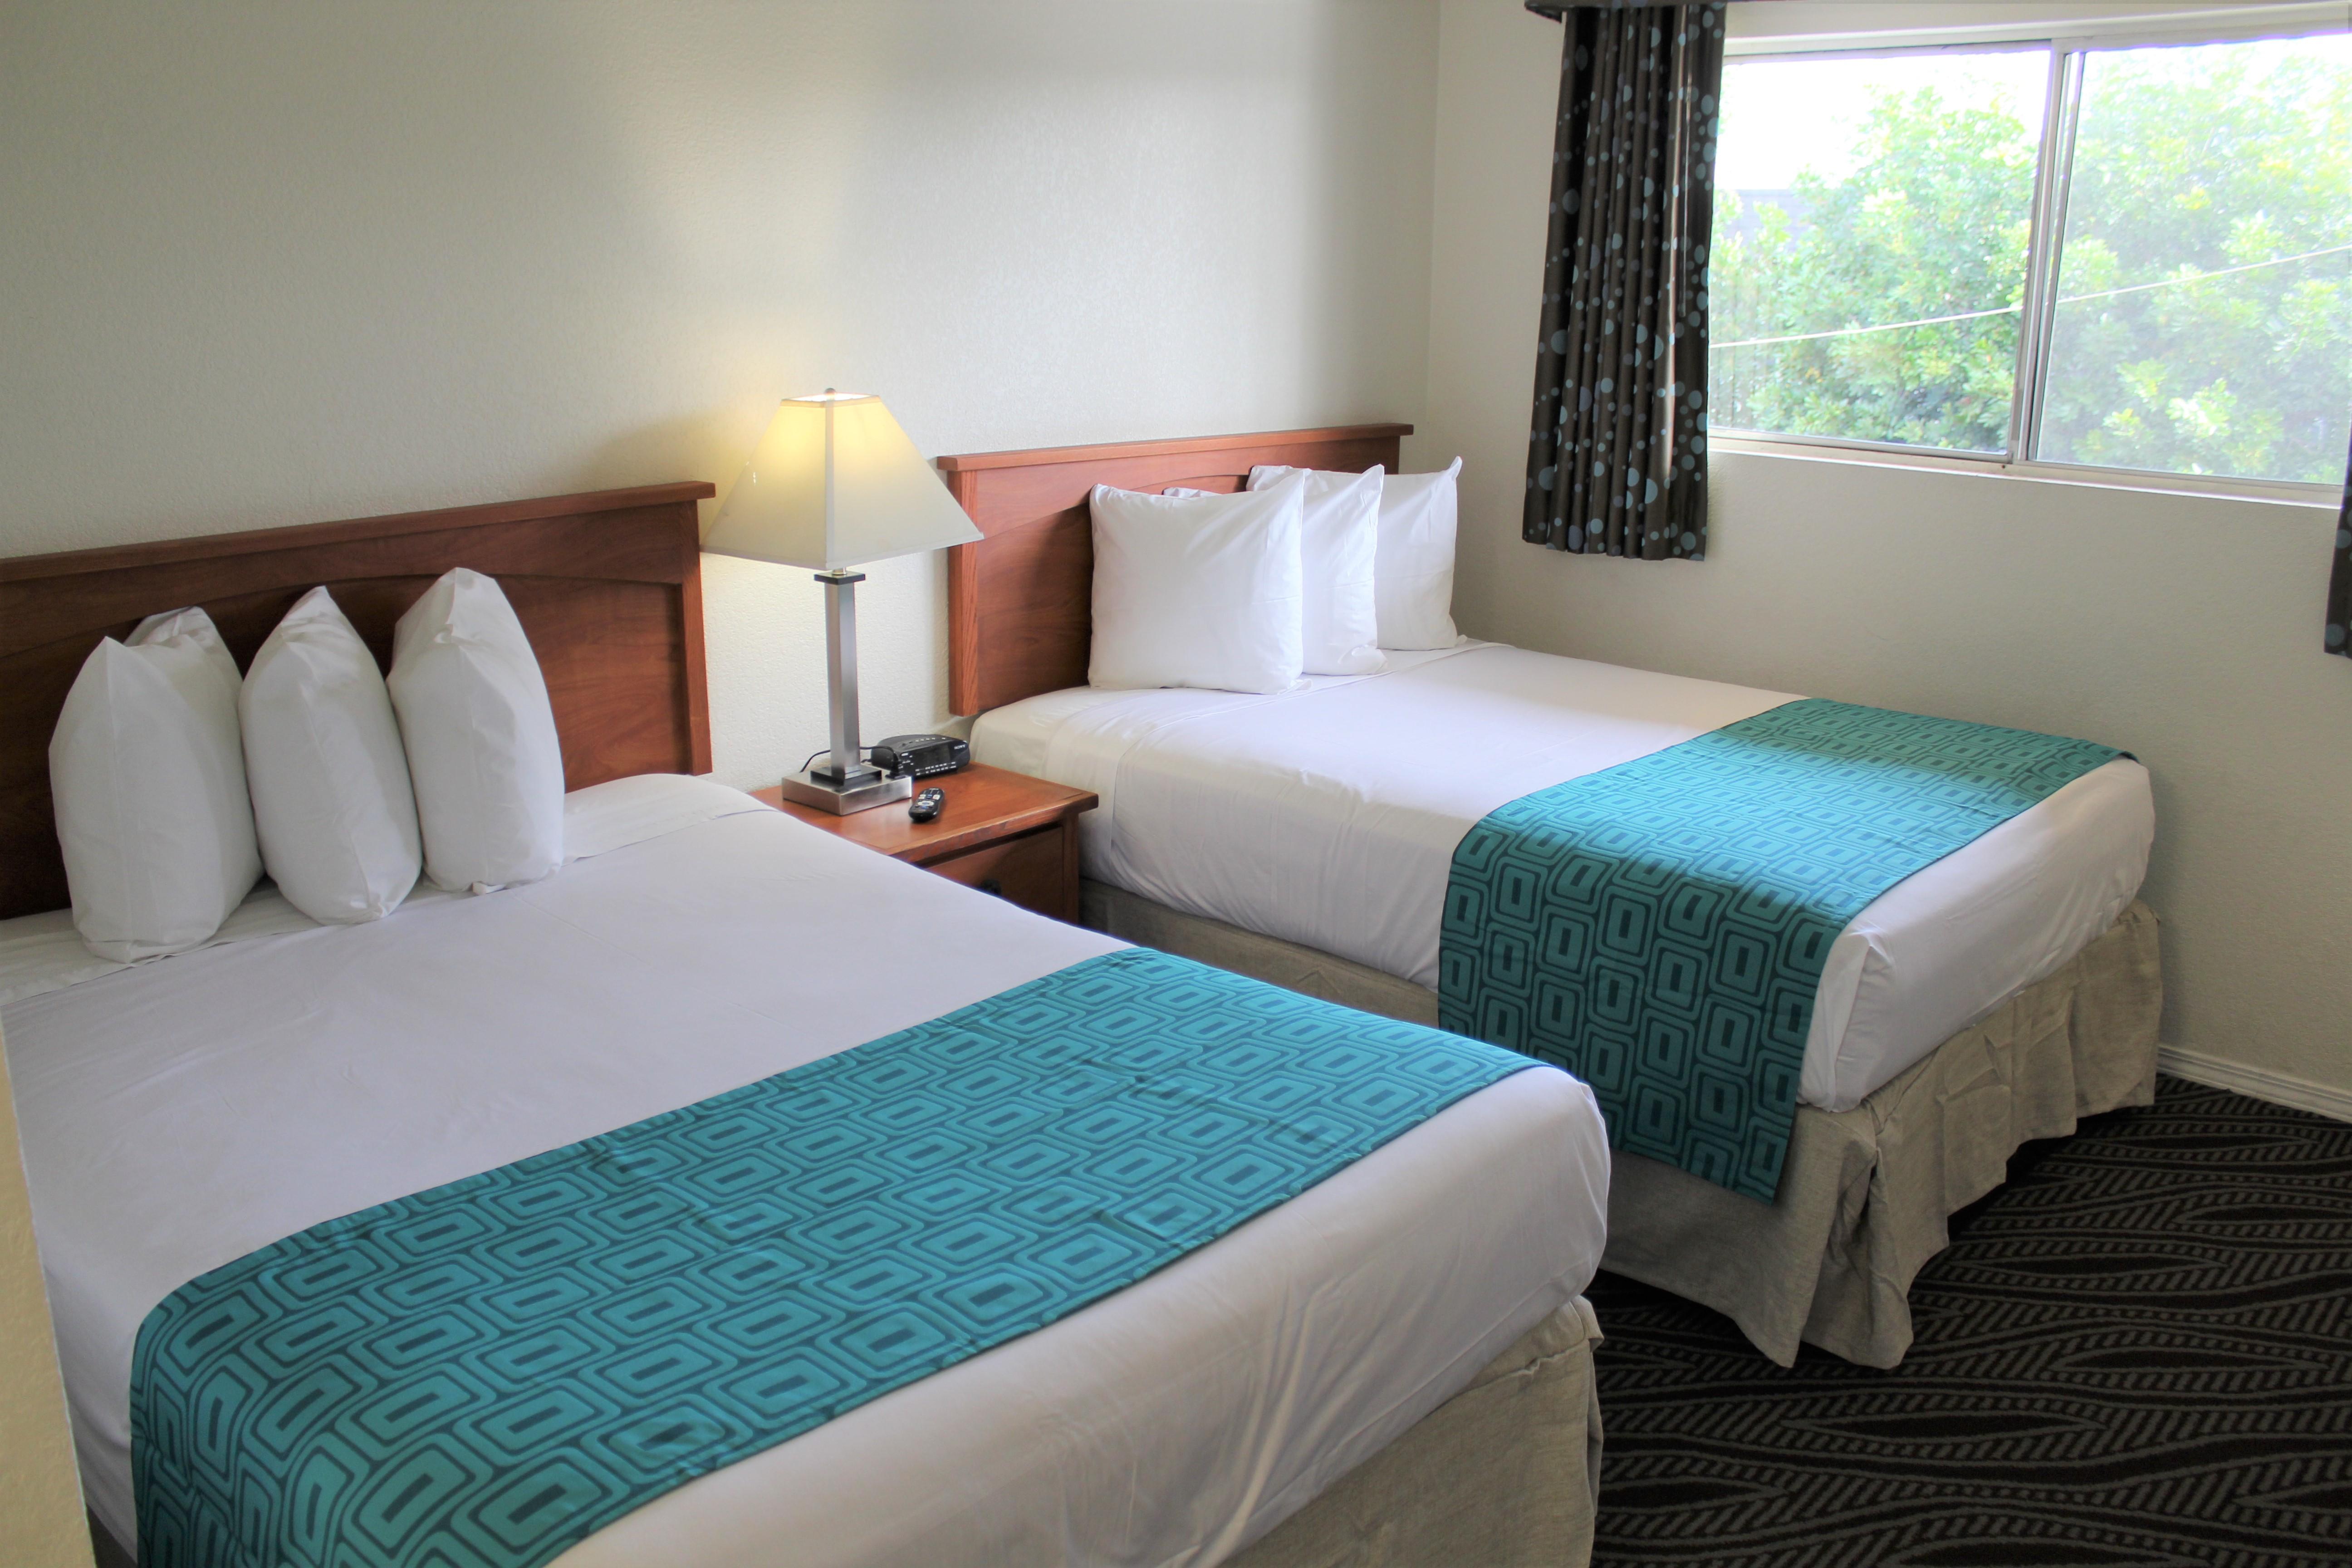 Howard Johnson by Wyndham Chula Vista San Diego Suite Hotel image 4